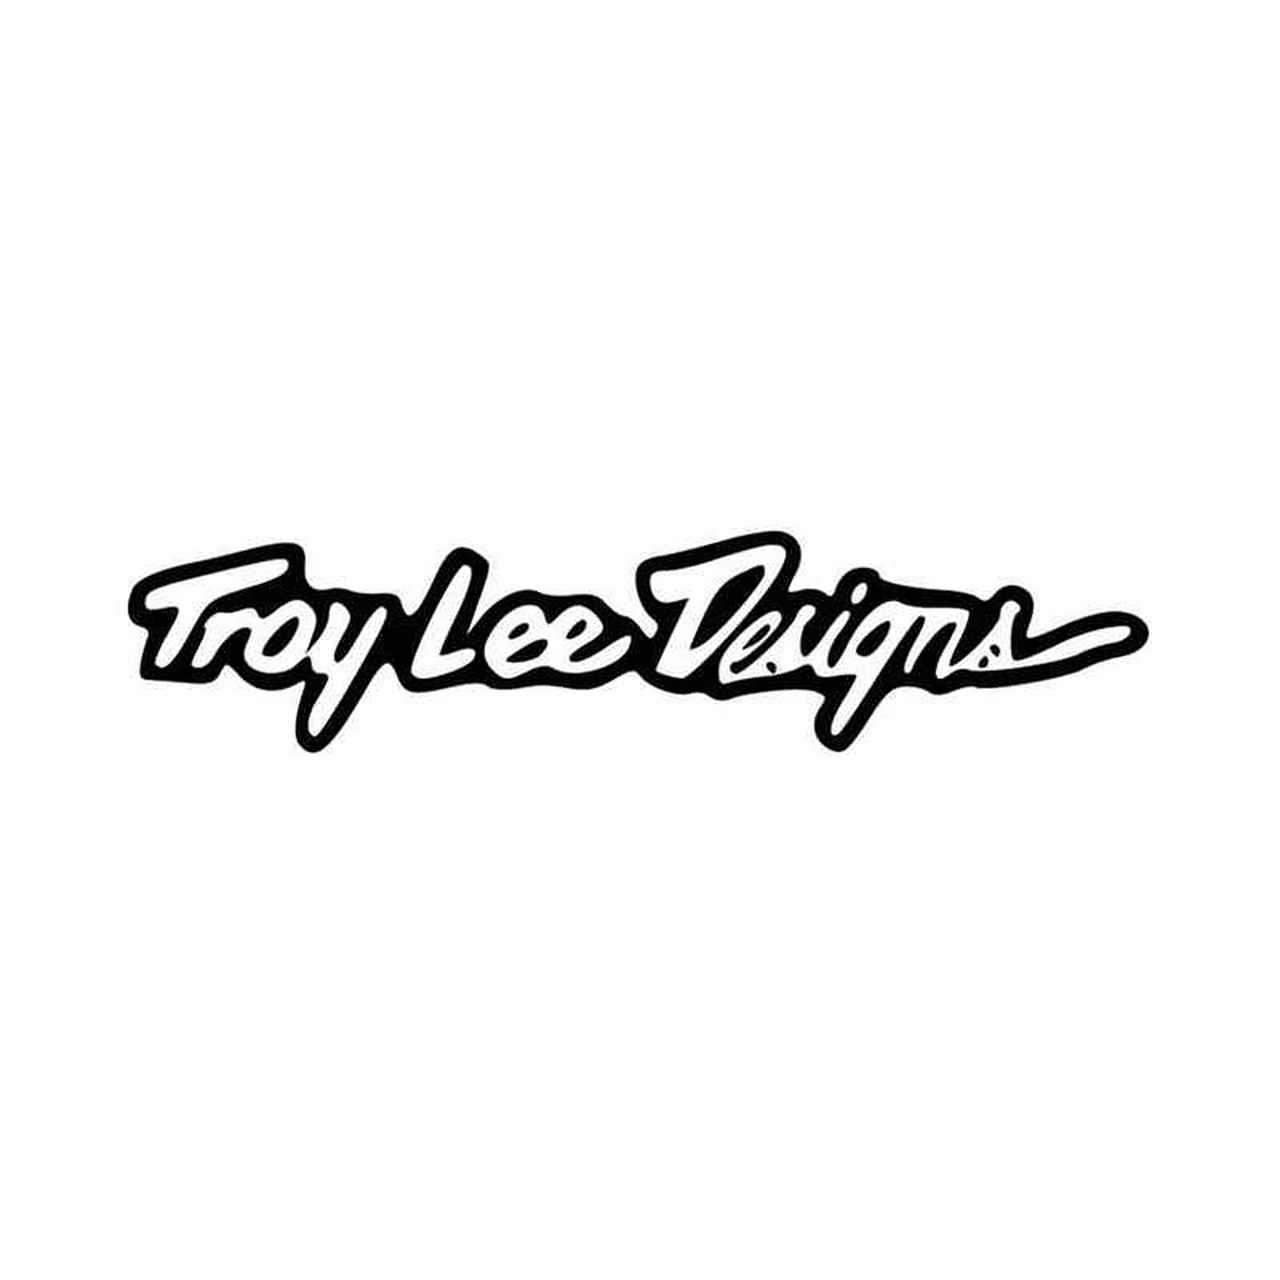 Troy-Lee-Designs-Text-Bold-Logo-Vinyl-Decal-Sticker__30214.1507851719.jpg